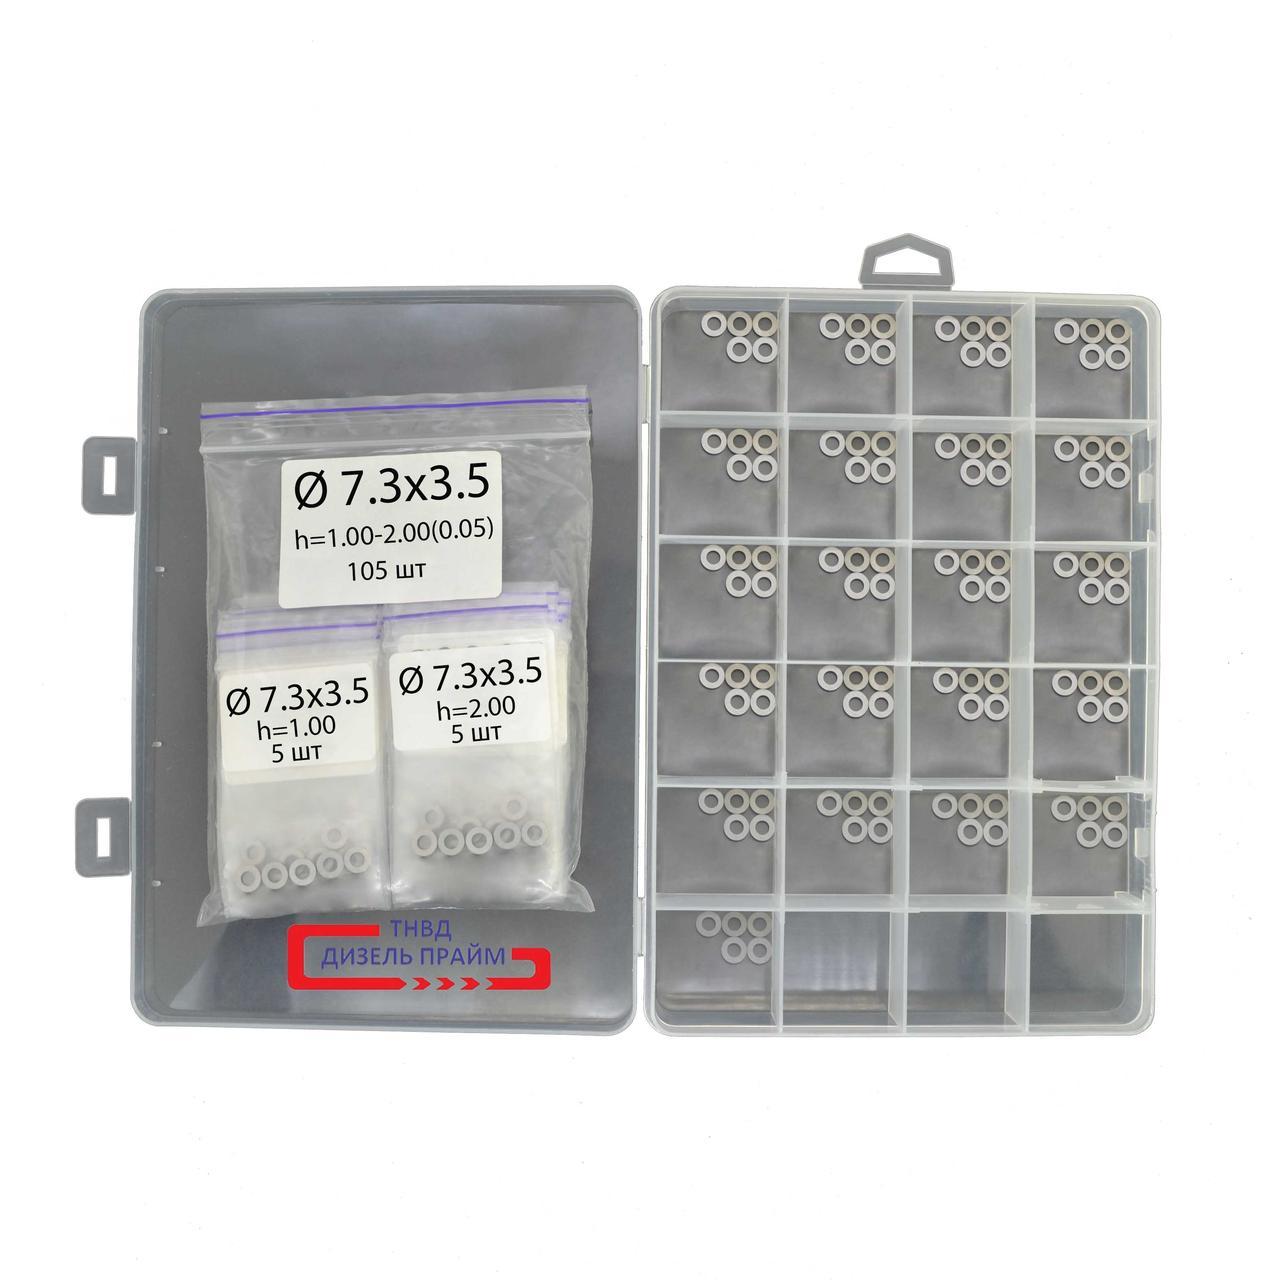 Регулировочная шайба форсунки МТЗ, 7,3 мм.* 3,5 мм. комплект 105 шт